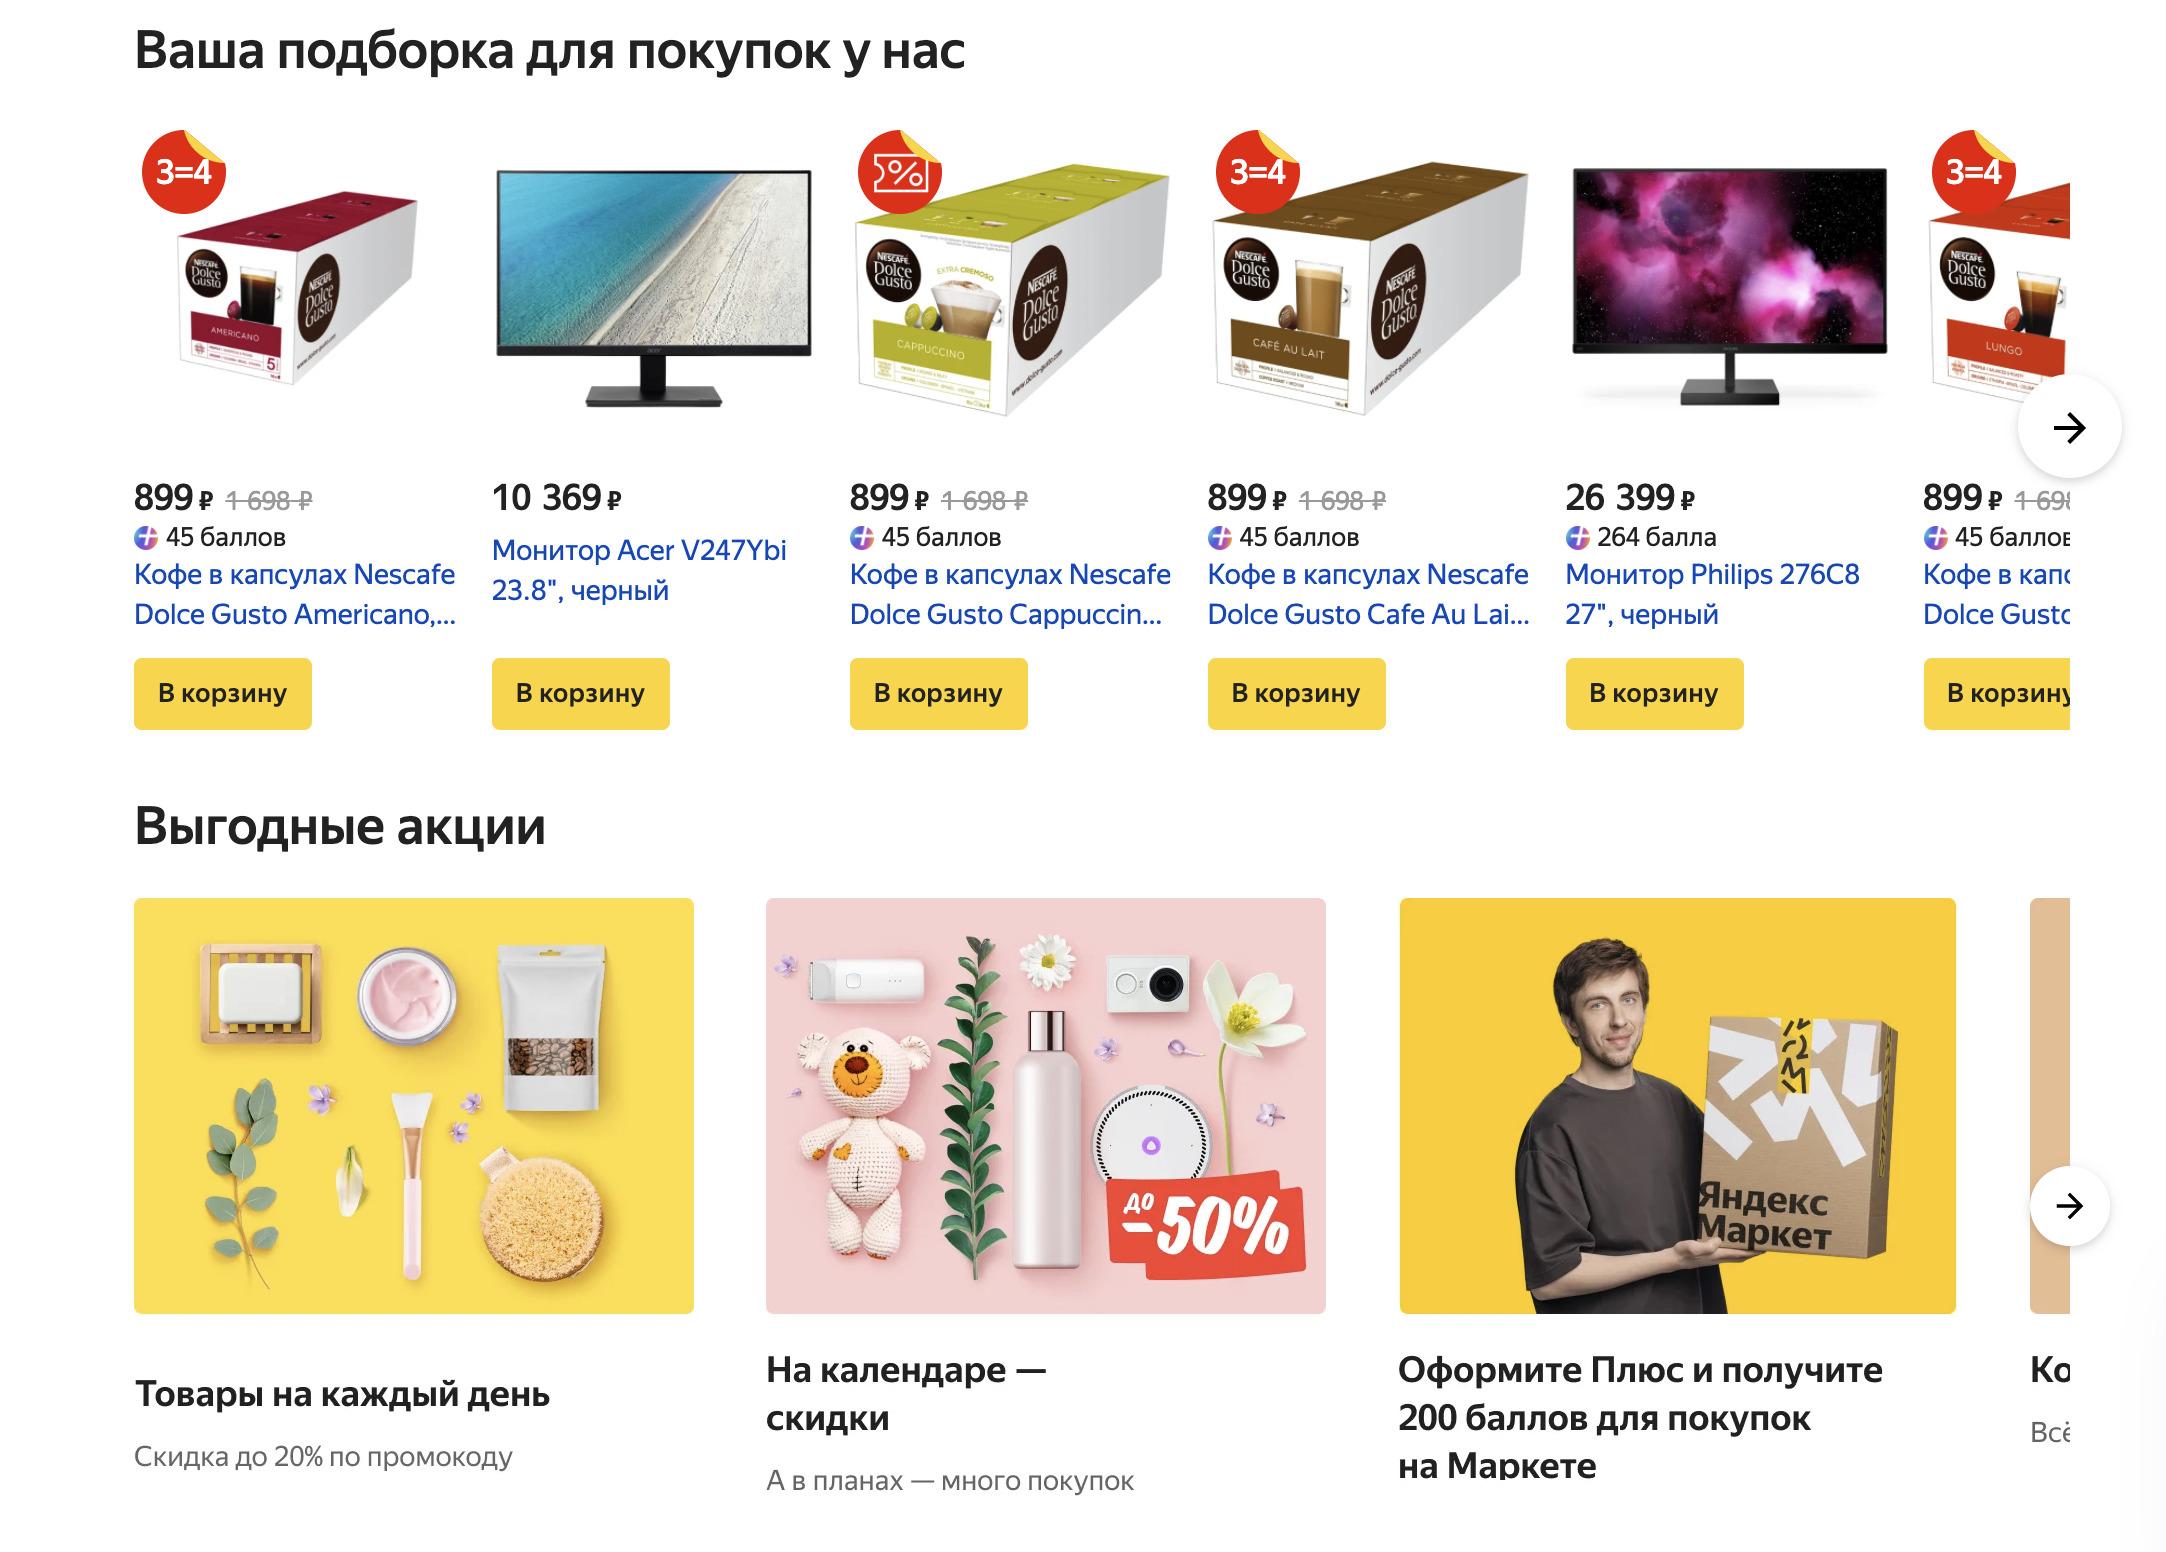 Доставка из Яндекс.Маркет в Пенза, сроки, пункты выдачи, каталог